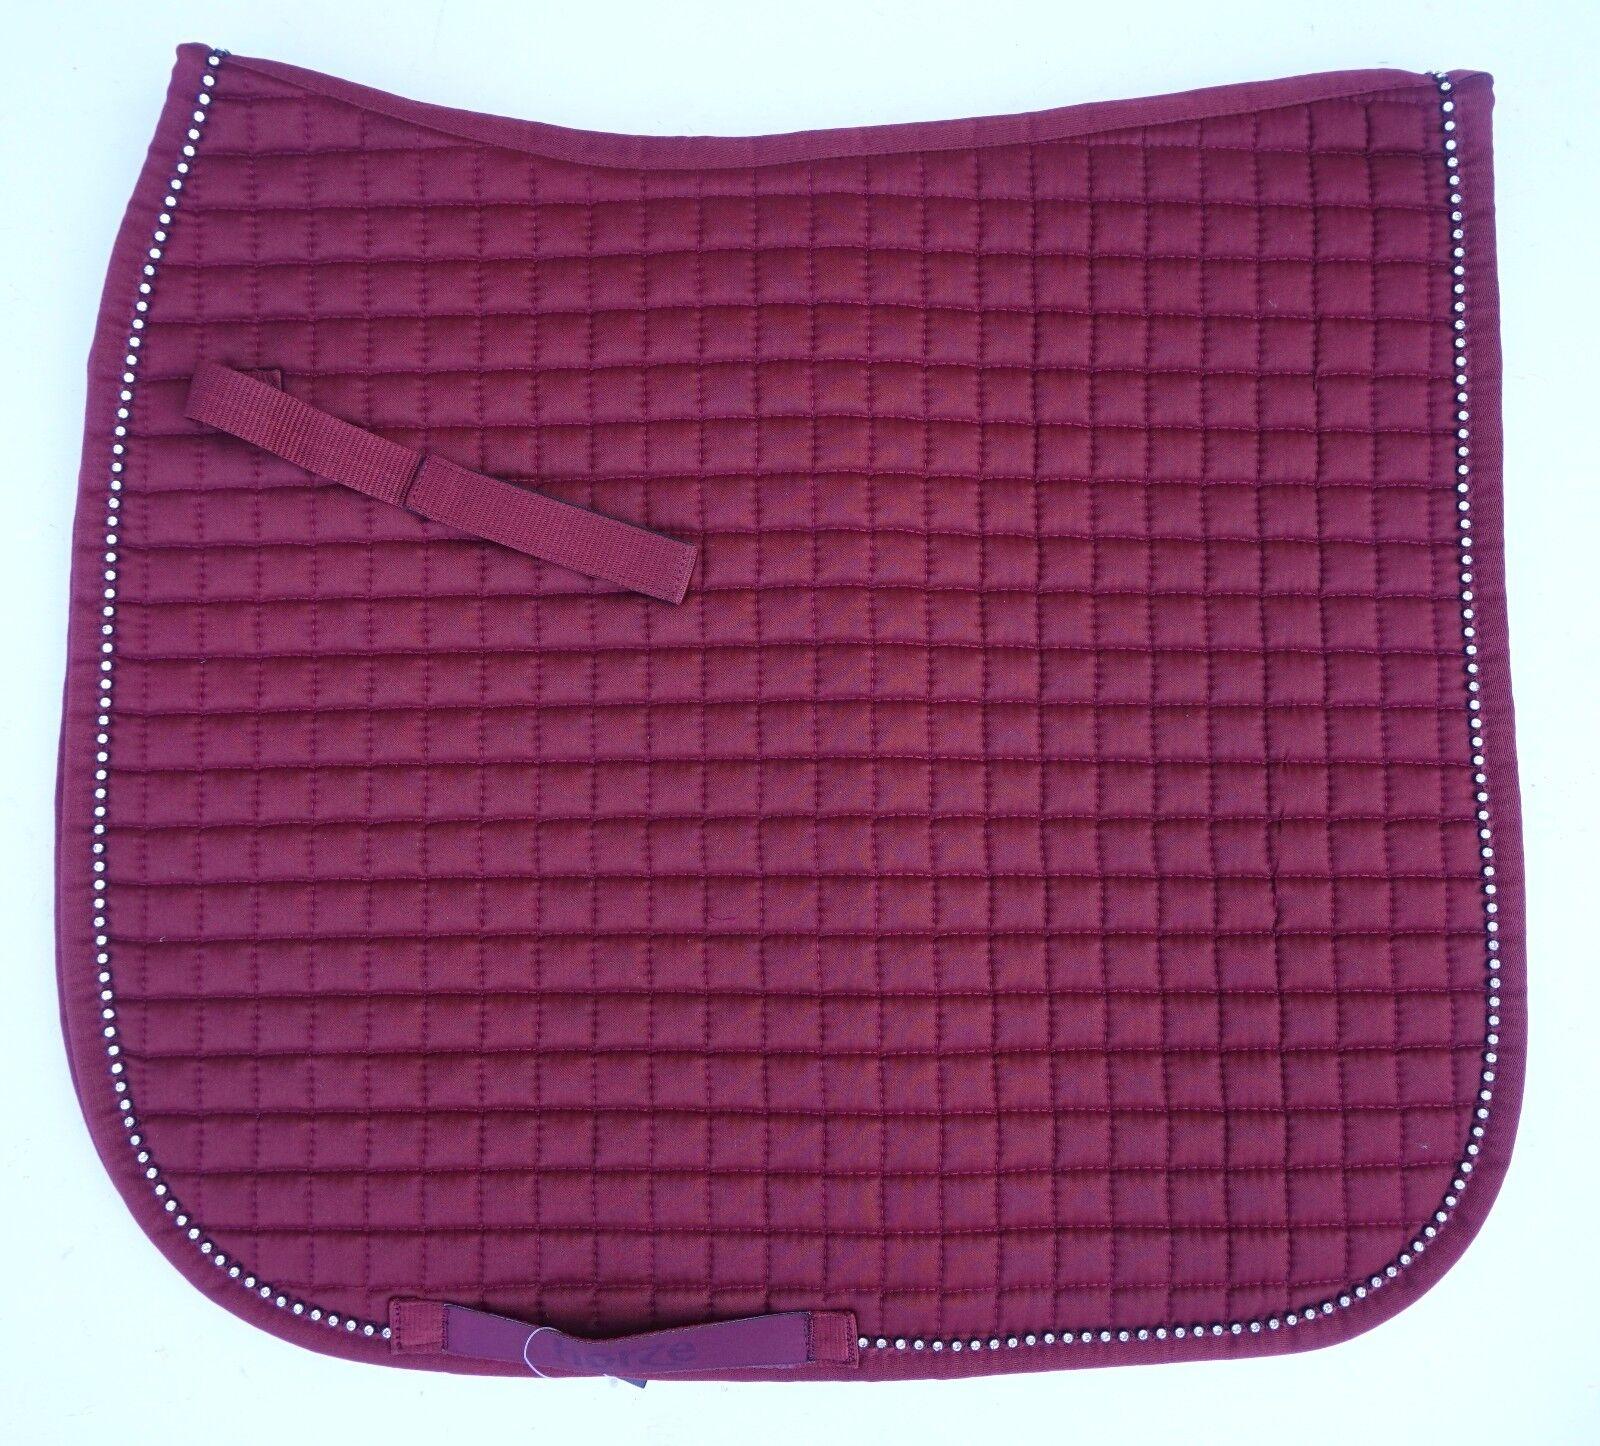 Horze Duchess Dressage Crystal Lined English Saddle  Pad Pony or Horse Size  online shopping